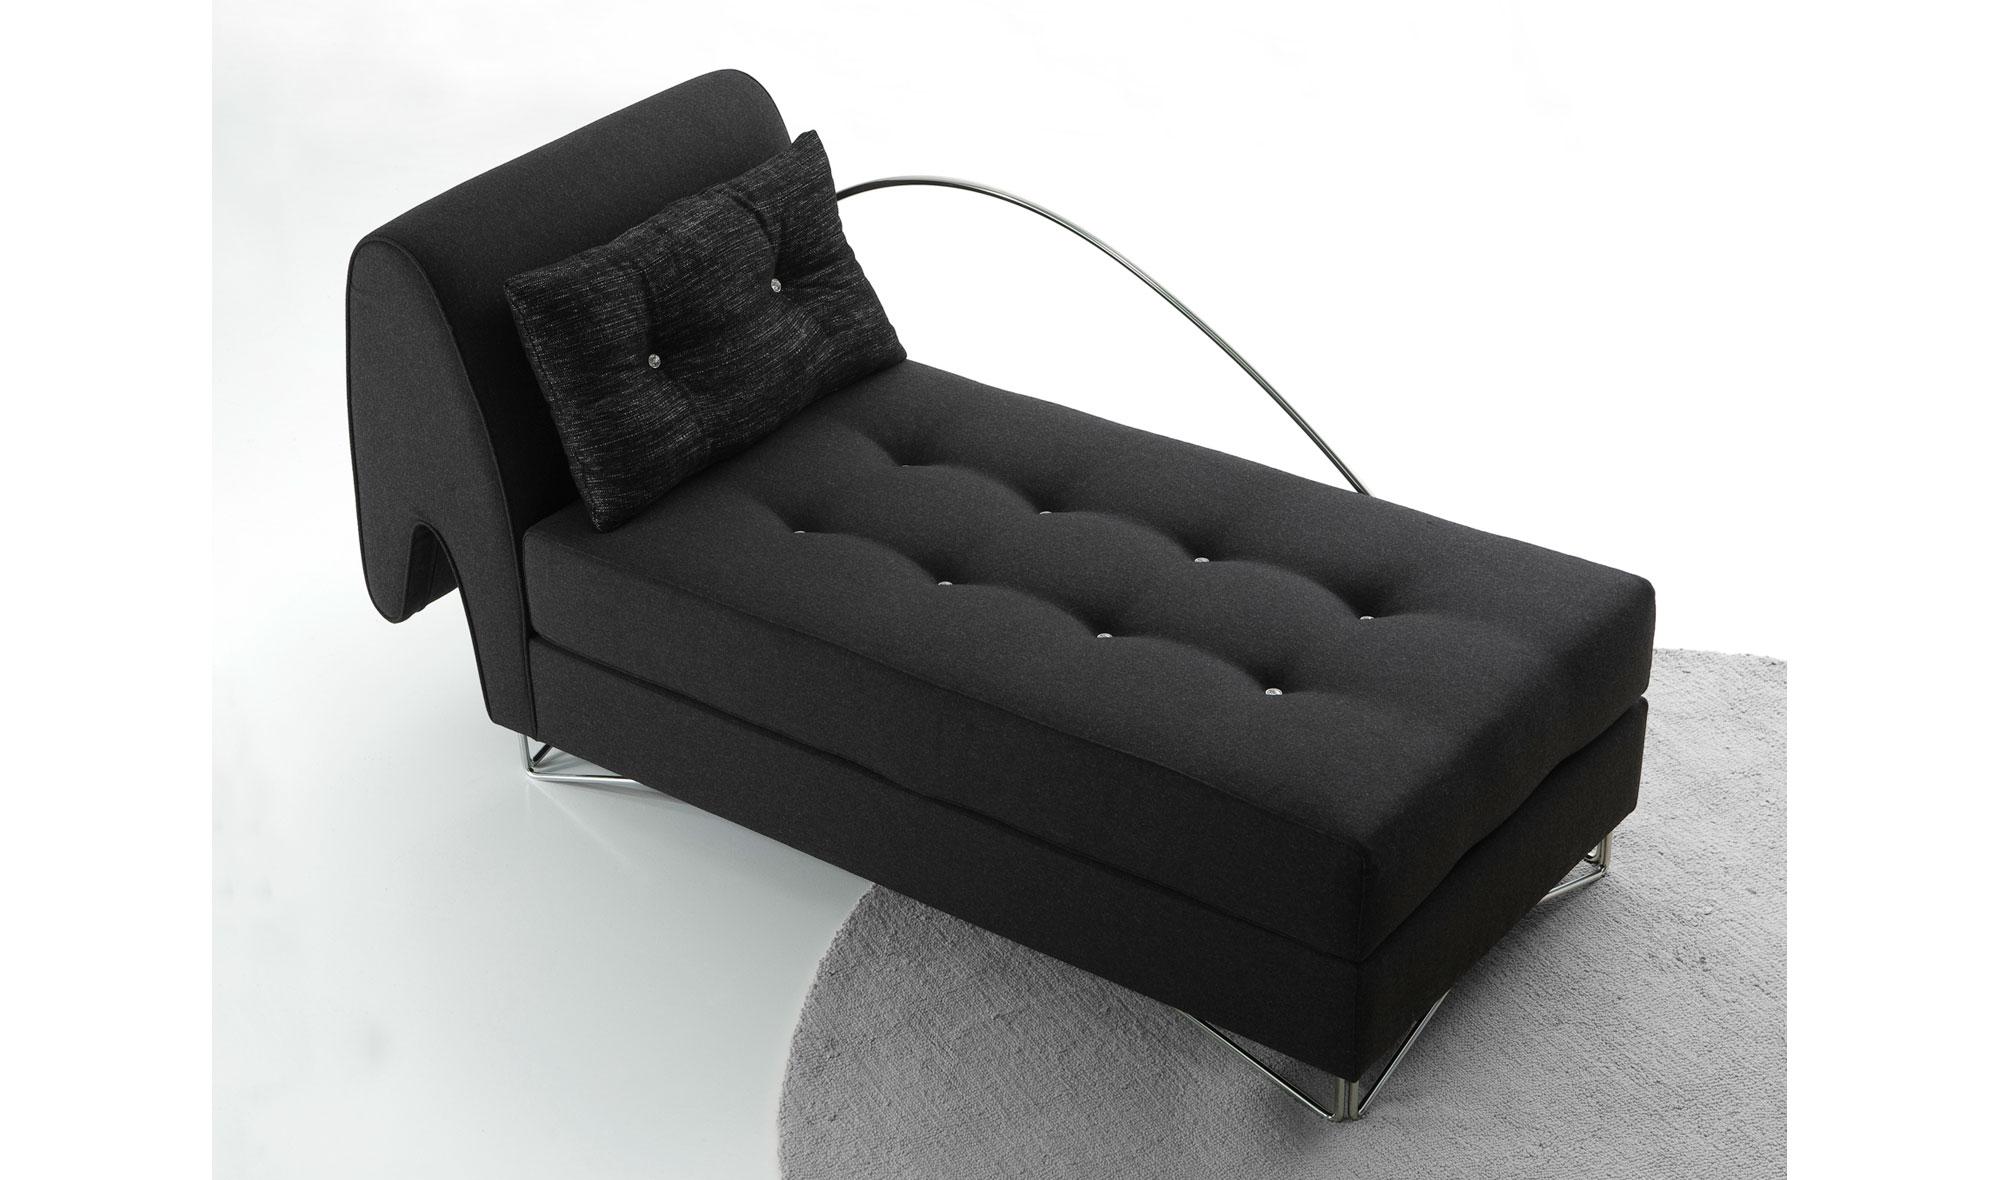 chaise longue moderno saurio en. Black Bedroom Furniture Sets. Home Design Ideas